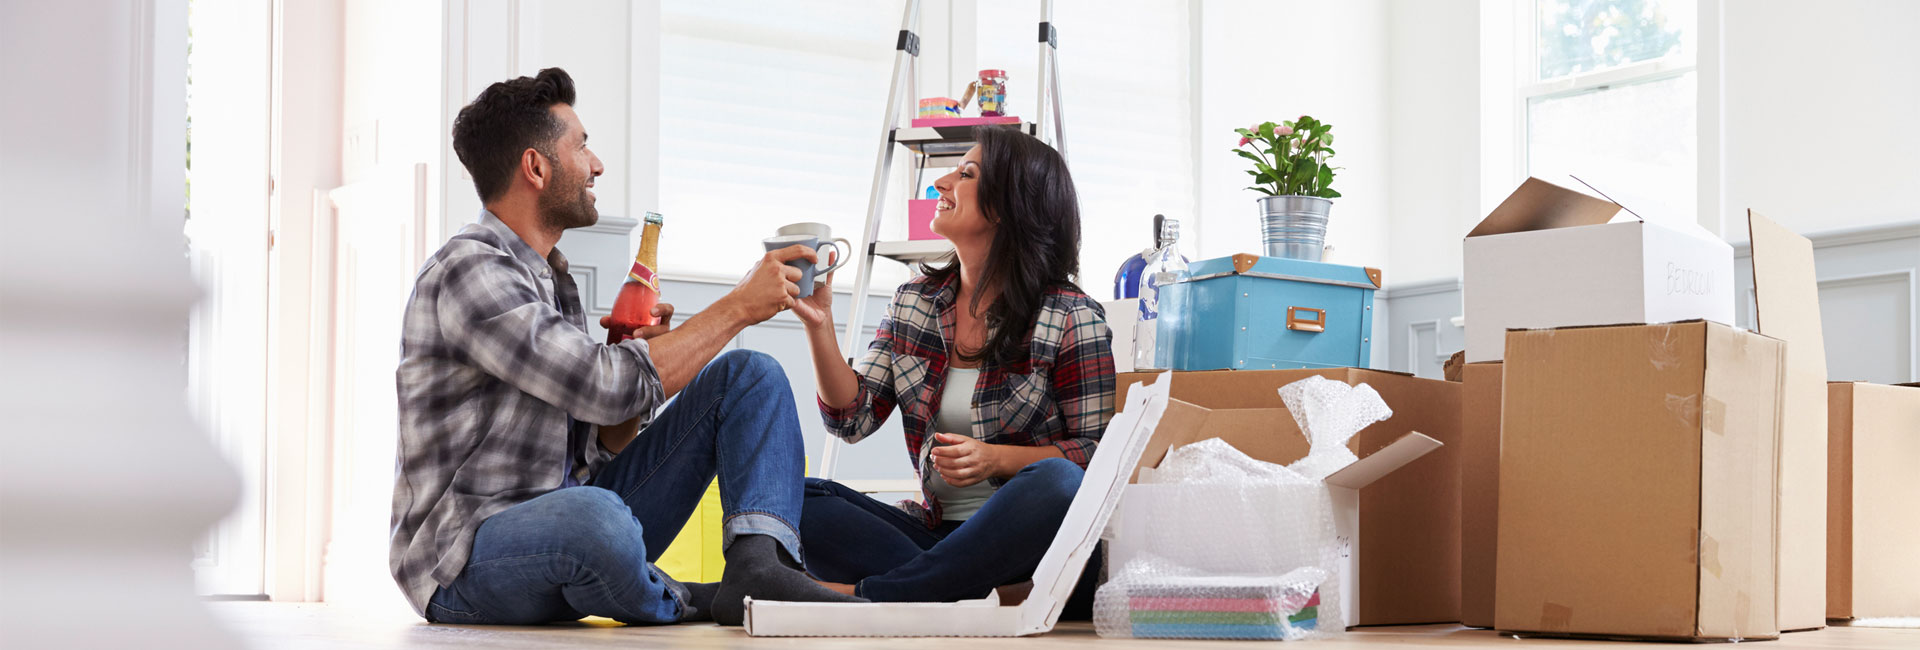 Local properties to rent or buy